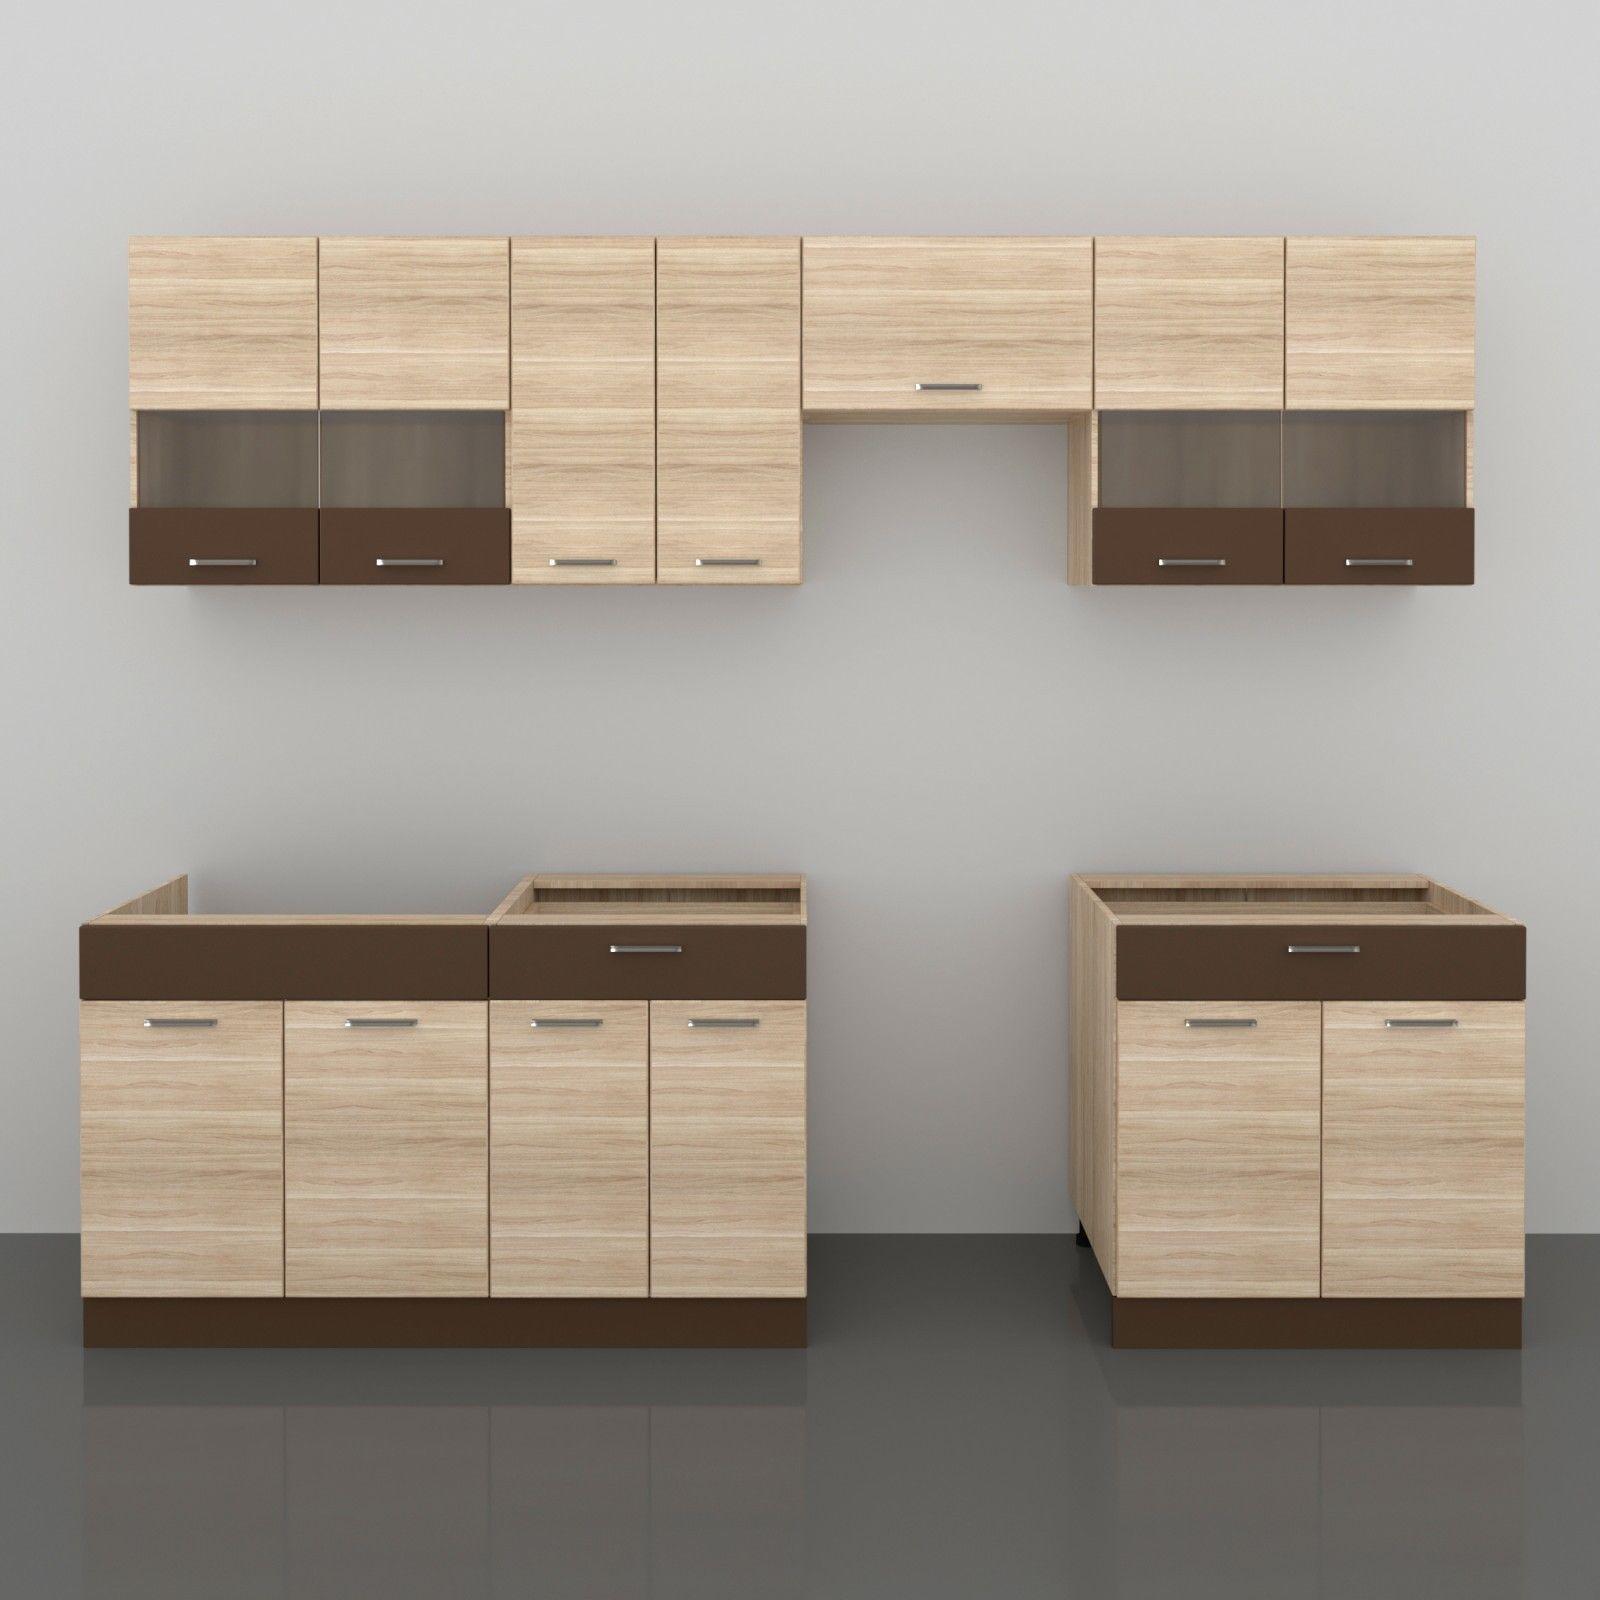 Küche ALINA 280 cm – Möbel DENA